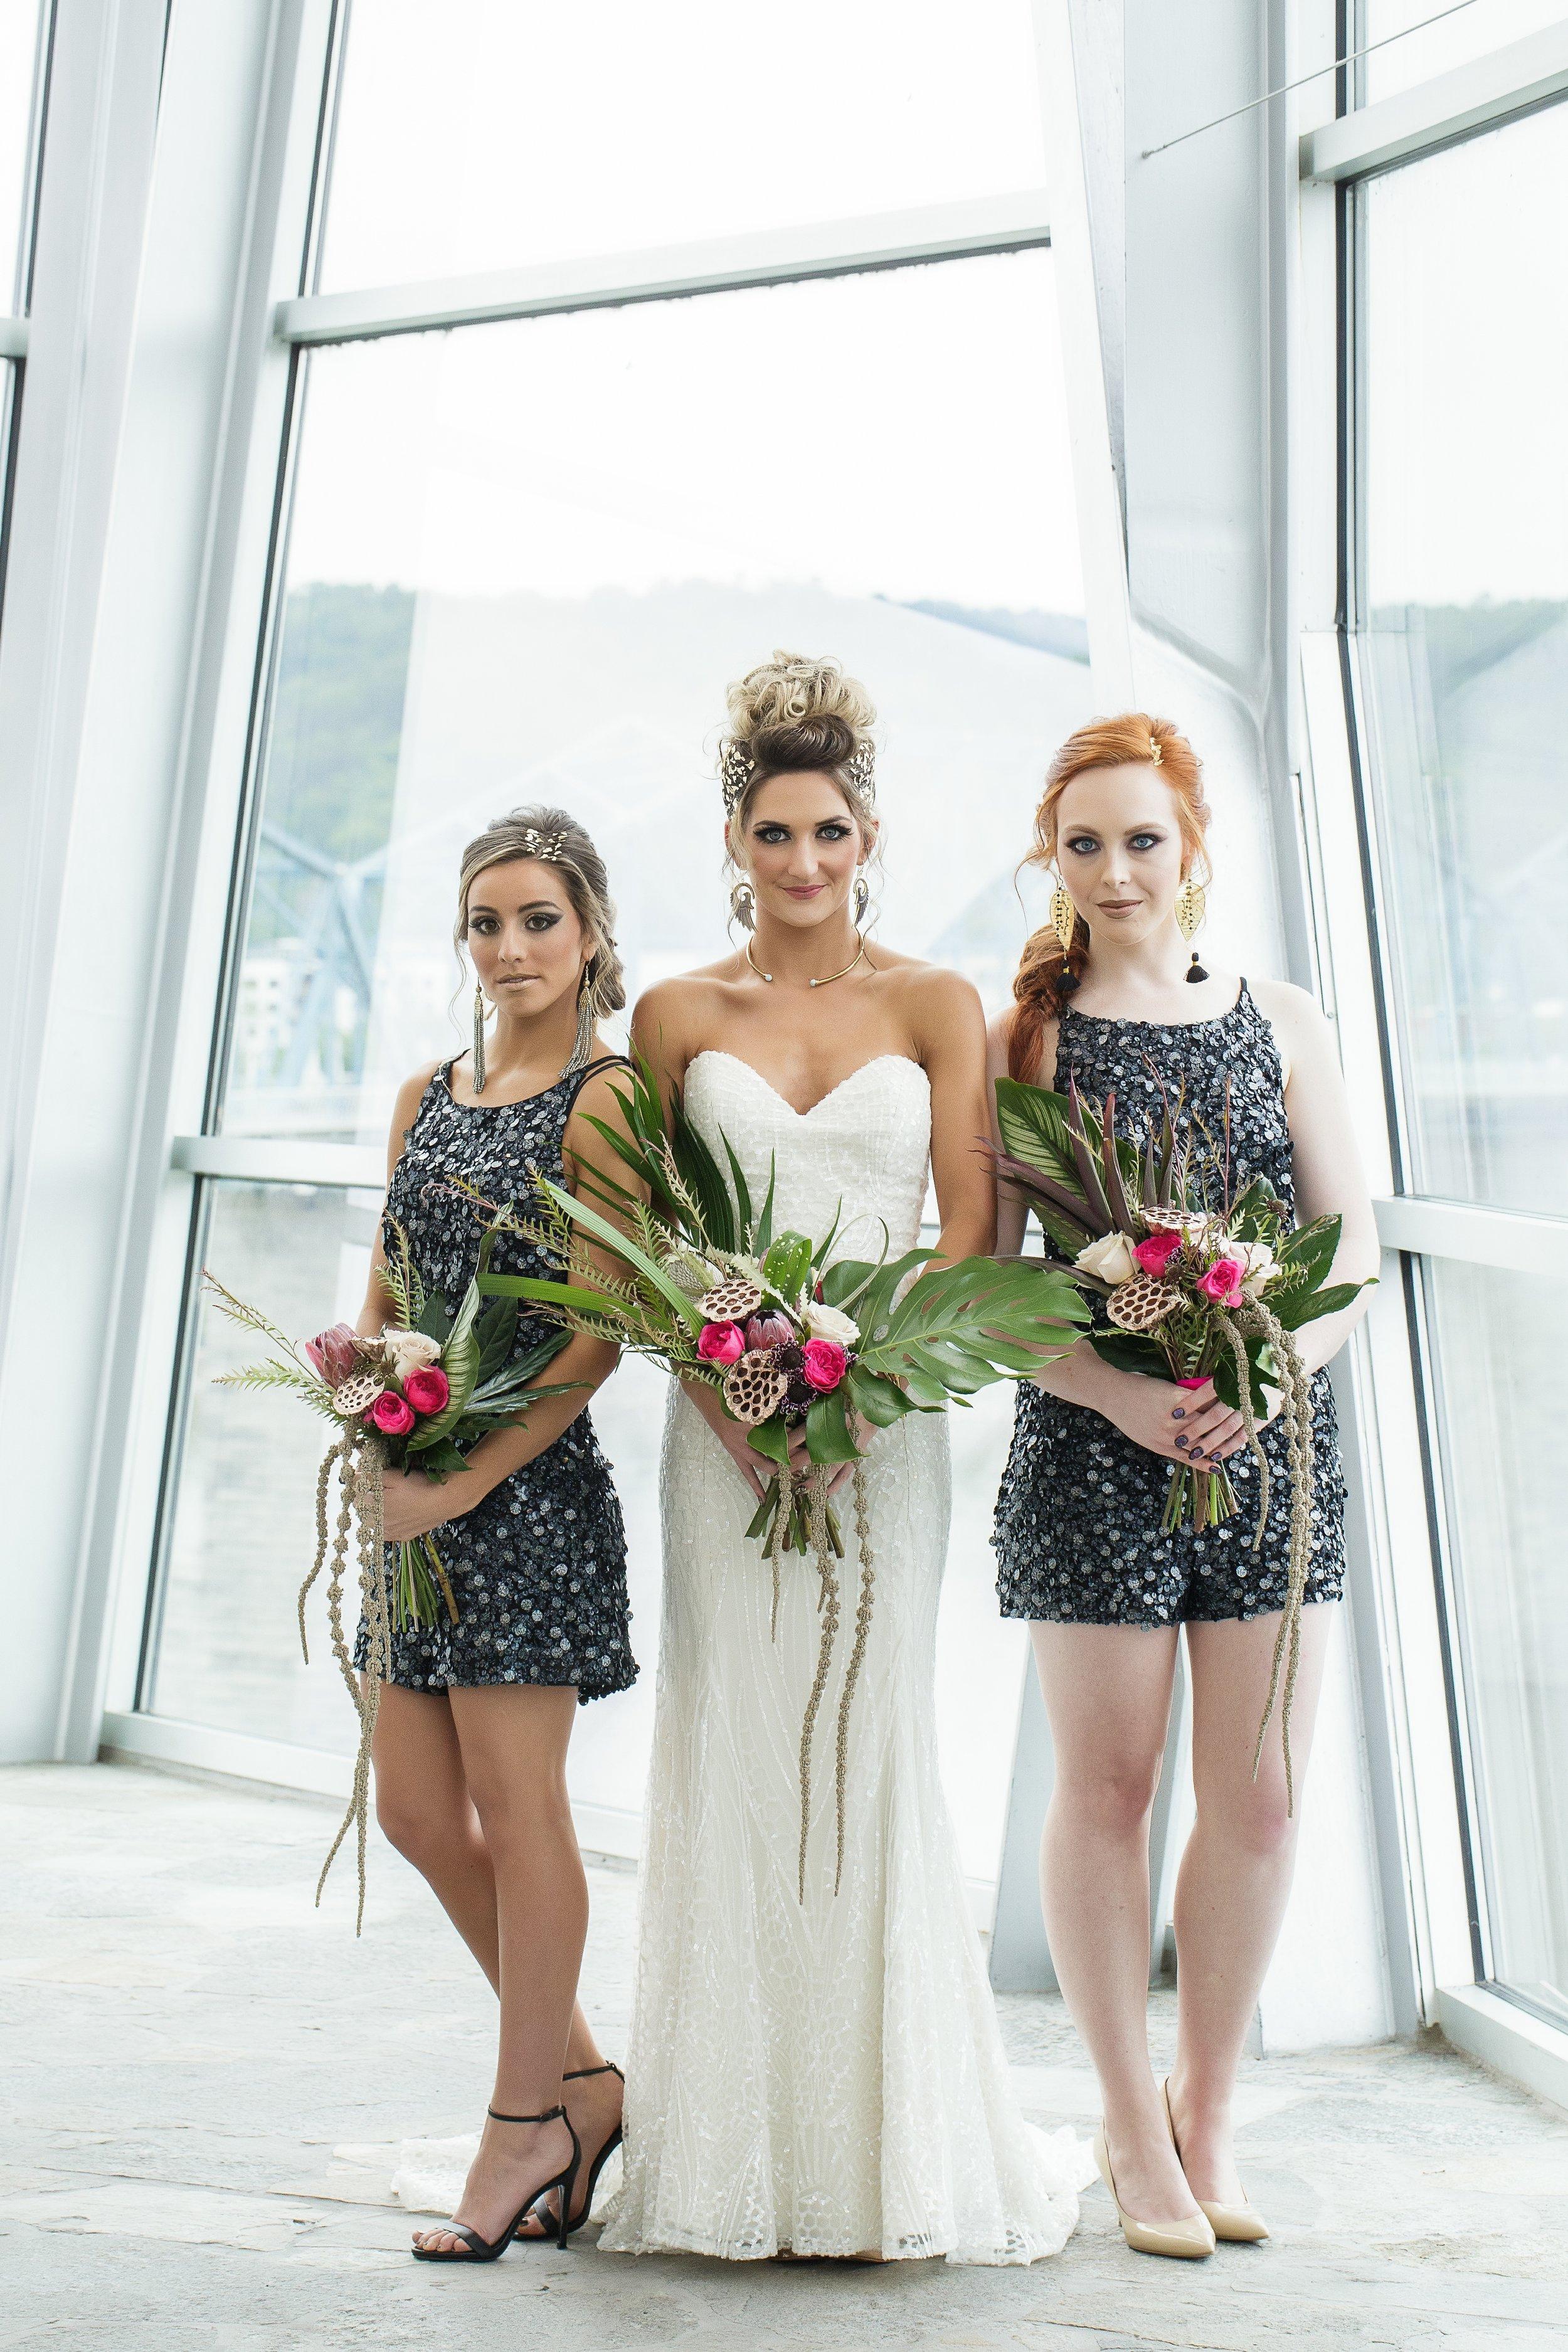 Fox-and-Fern-Bridal-Flowers-2050-Styled-Shoot.jpg